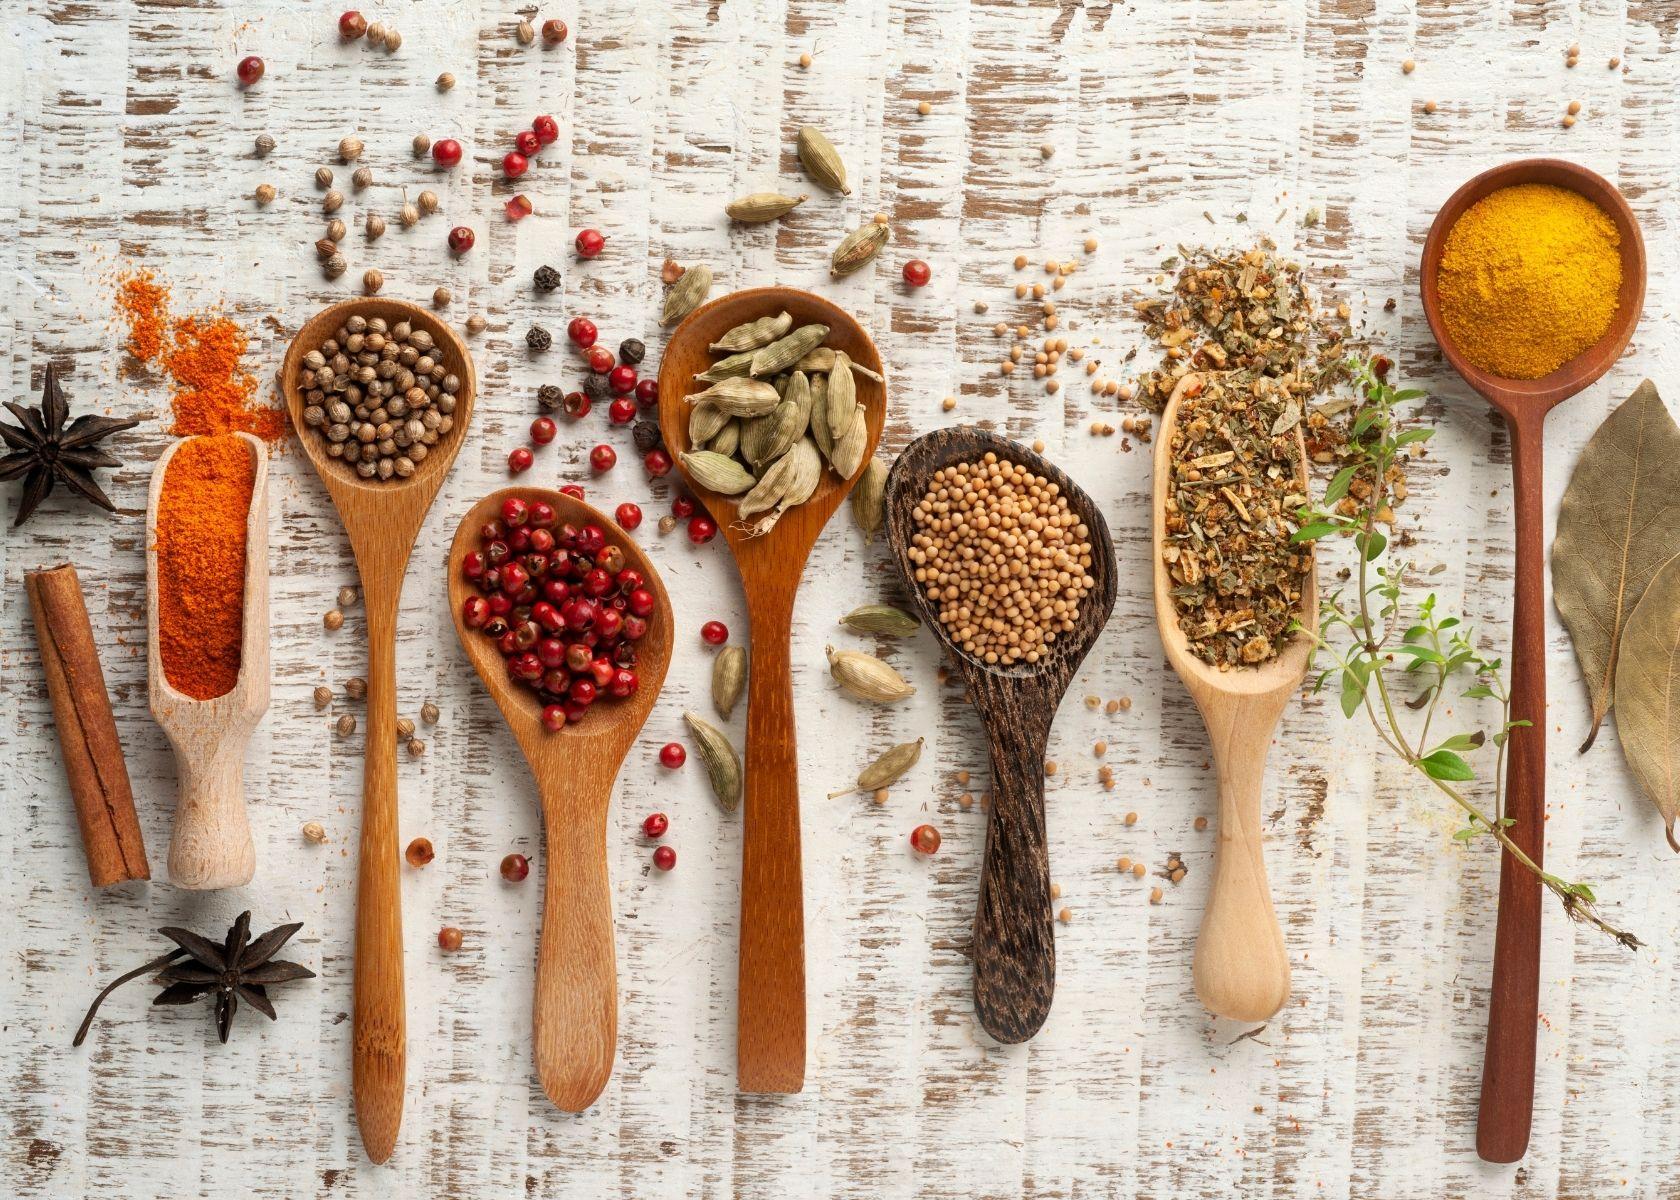 Various seasonings in lined up wooden spoons with some seasoning sprinkled on table.